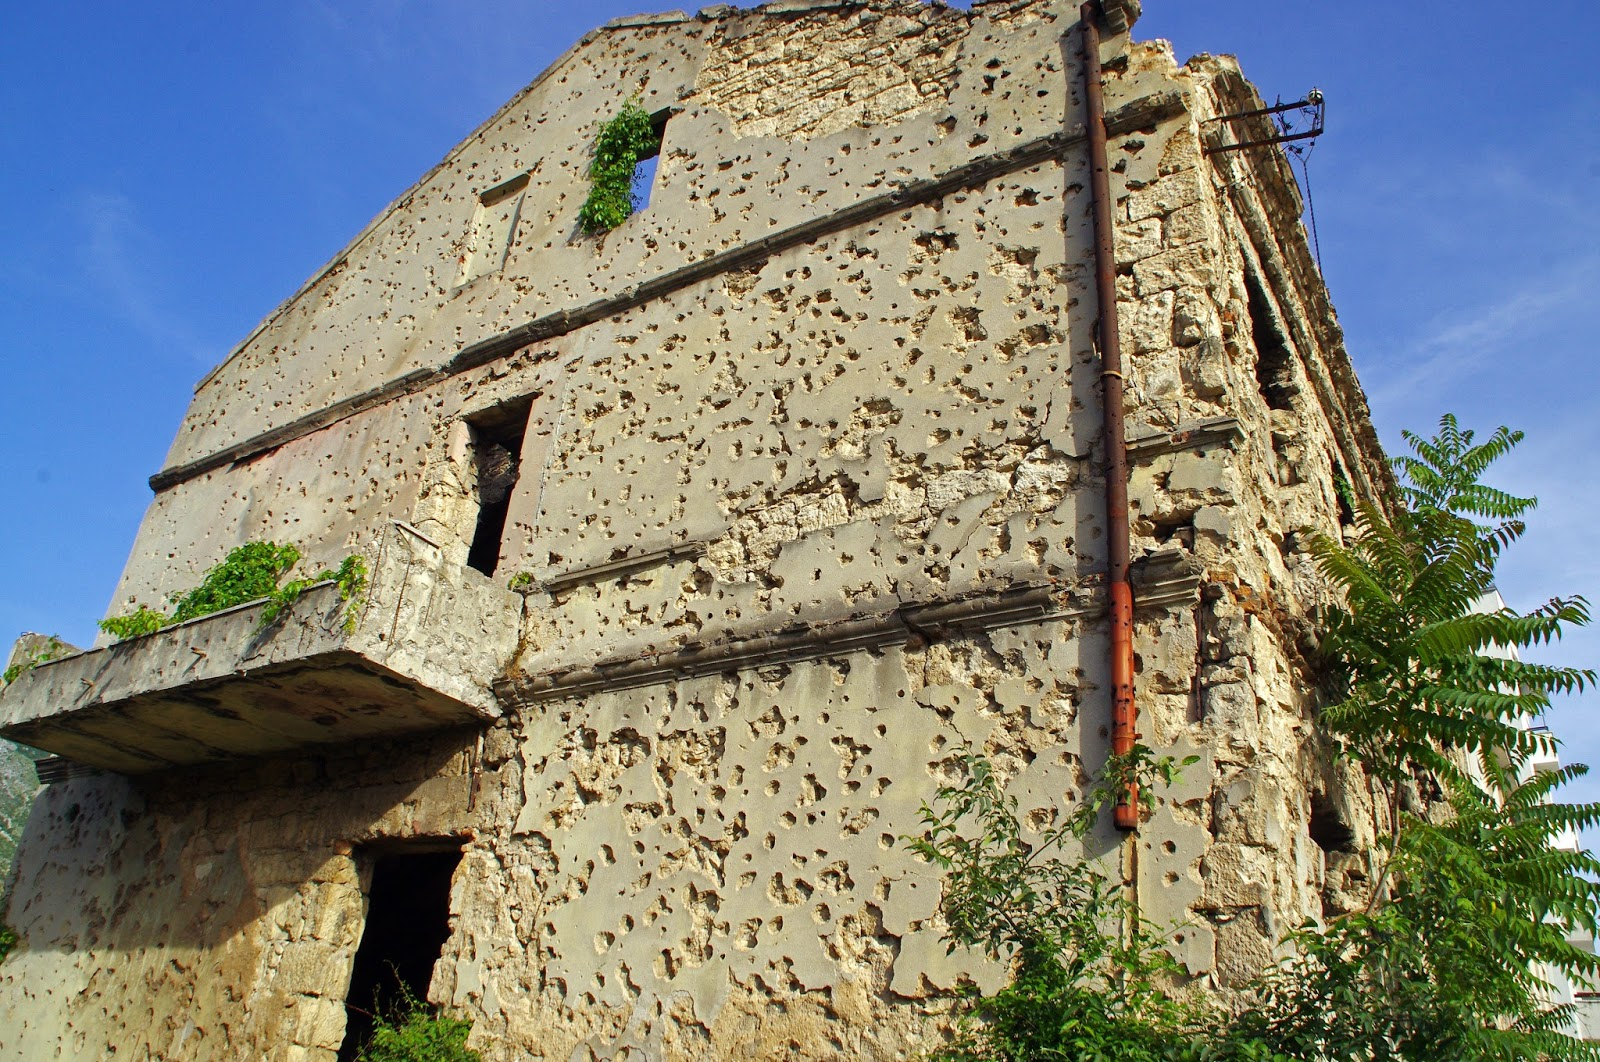 Bullet damaged buildings in Mostar